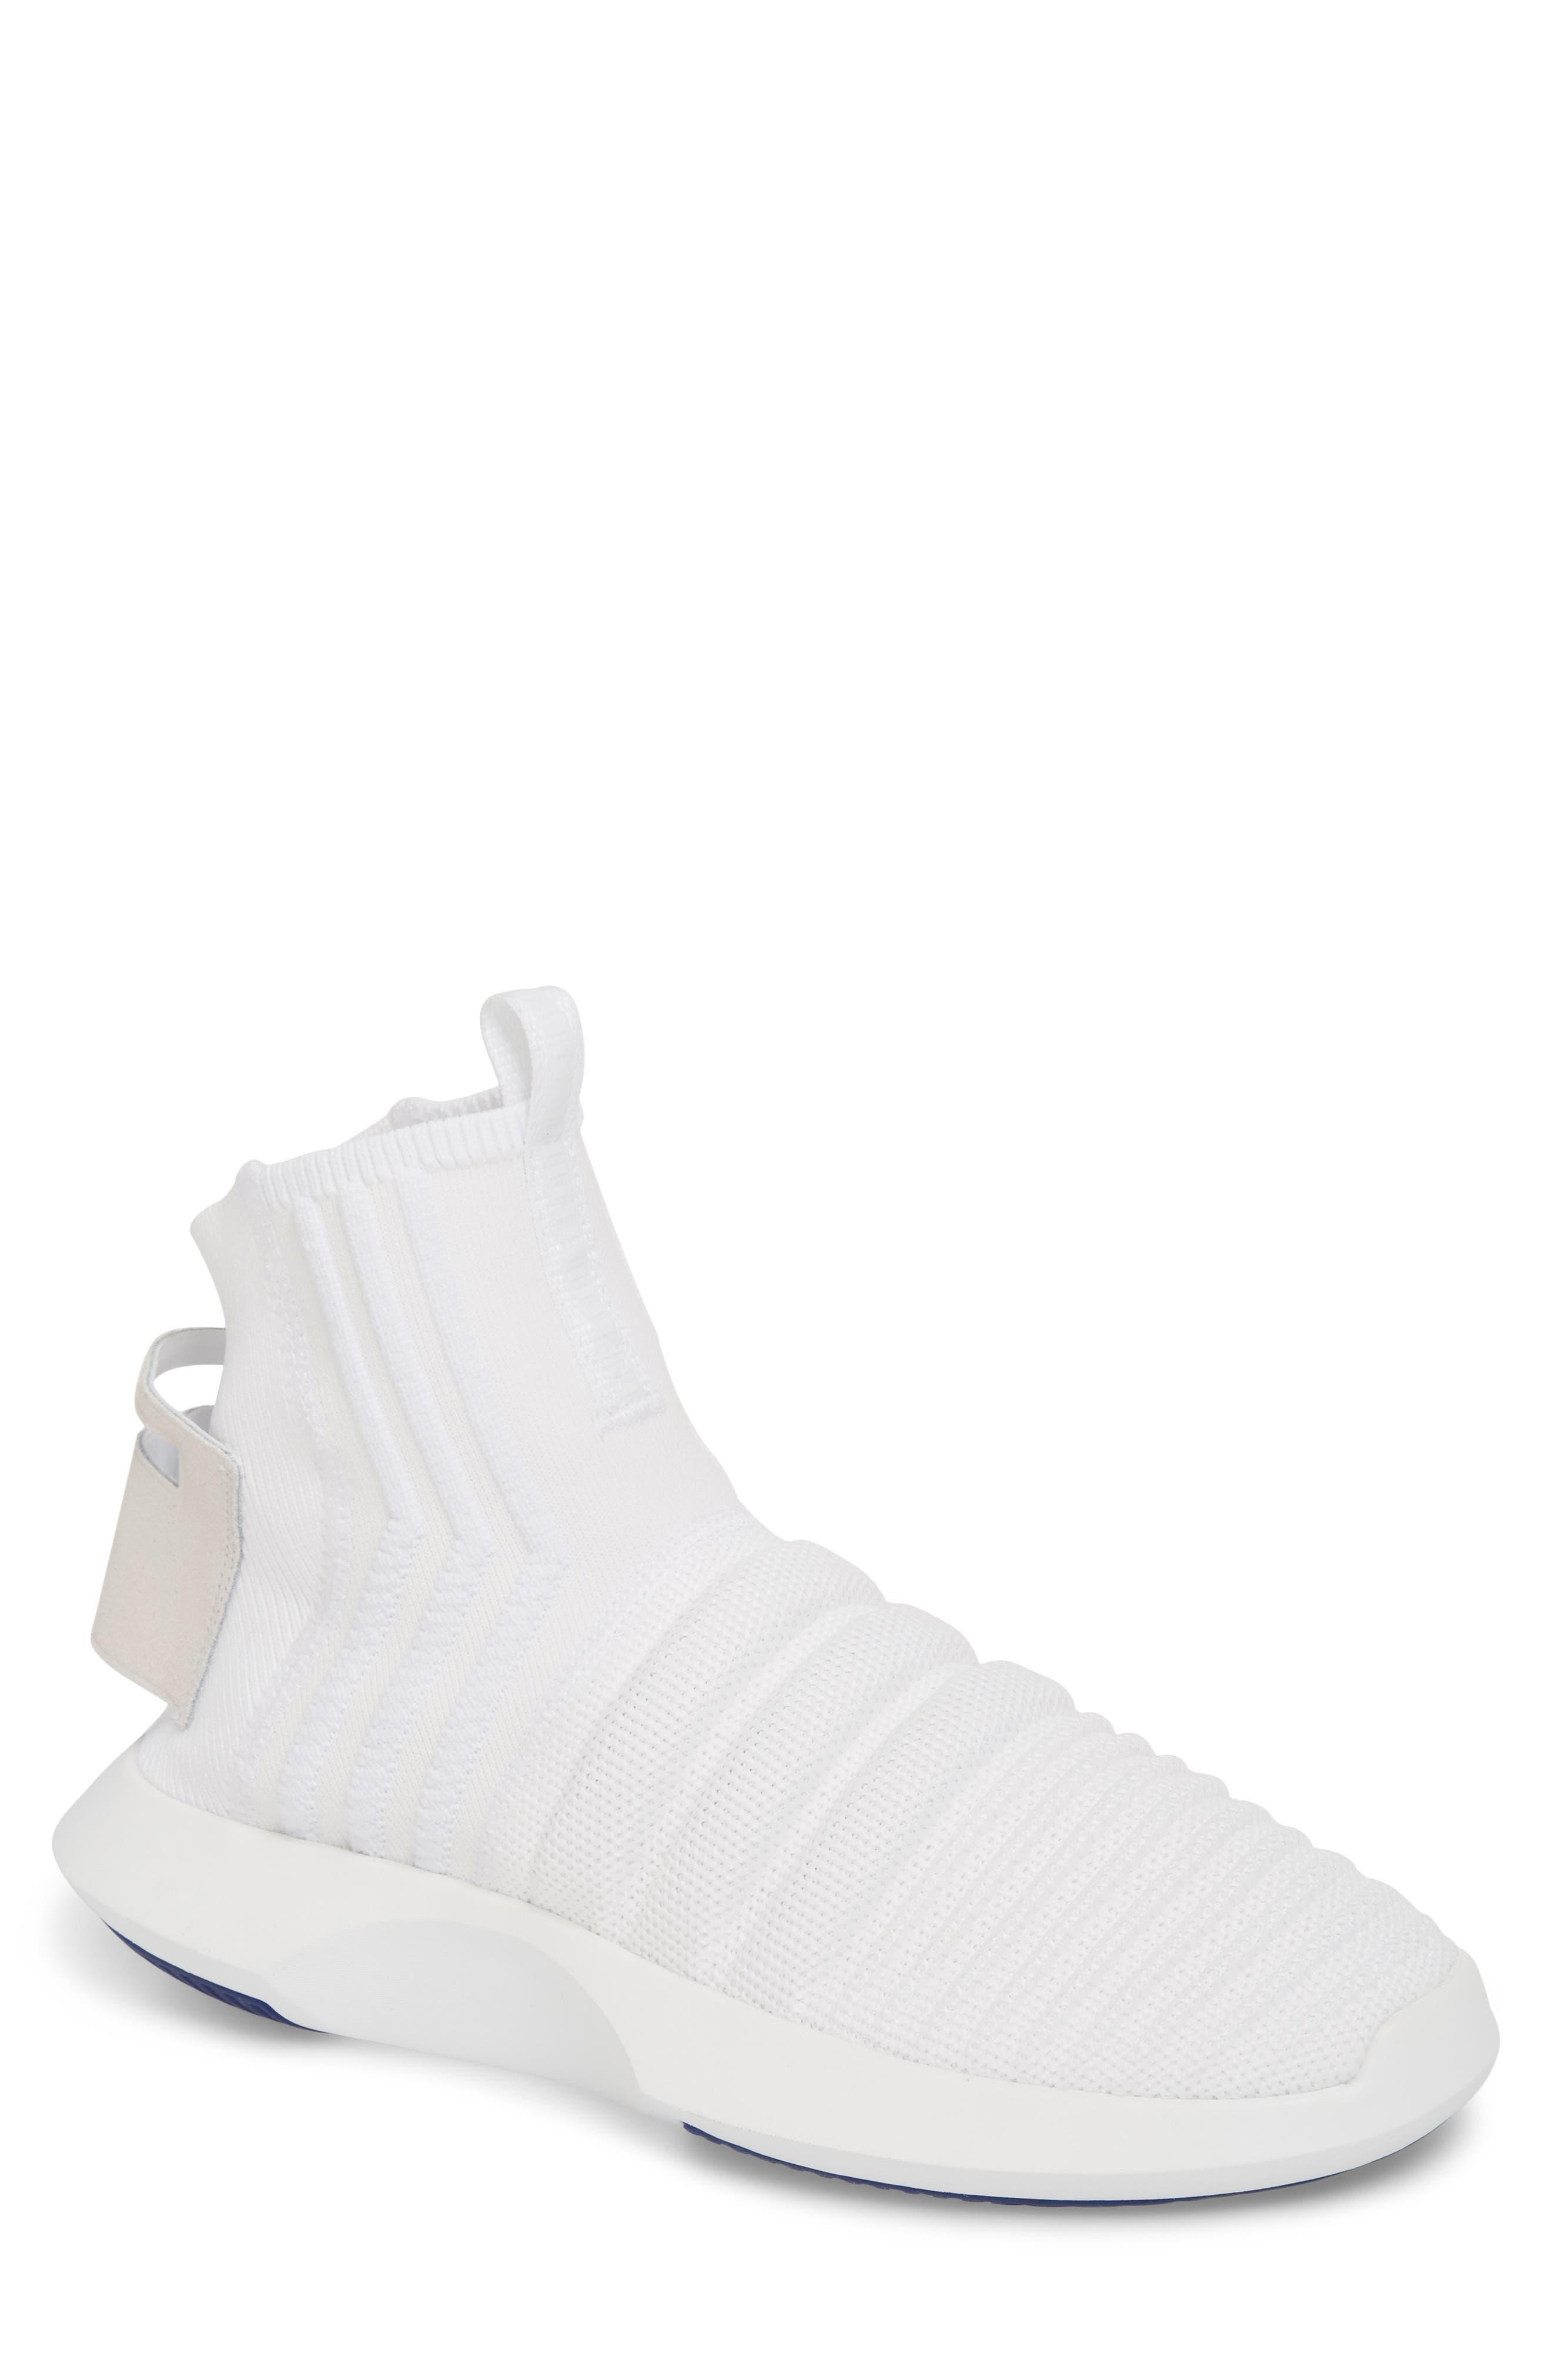 Crazy 1 ADV Sock Primeknit Sneaker,                             Main thumbnail 1, color,                             White/ Real Purple